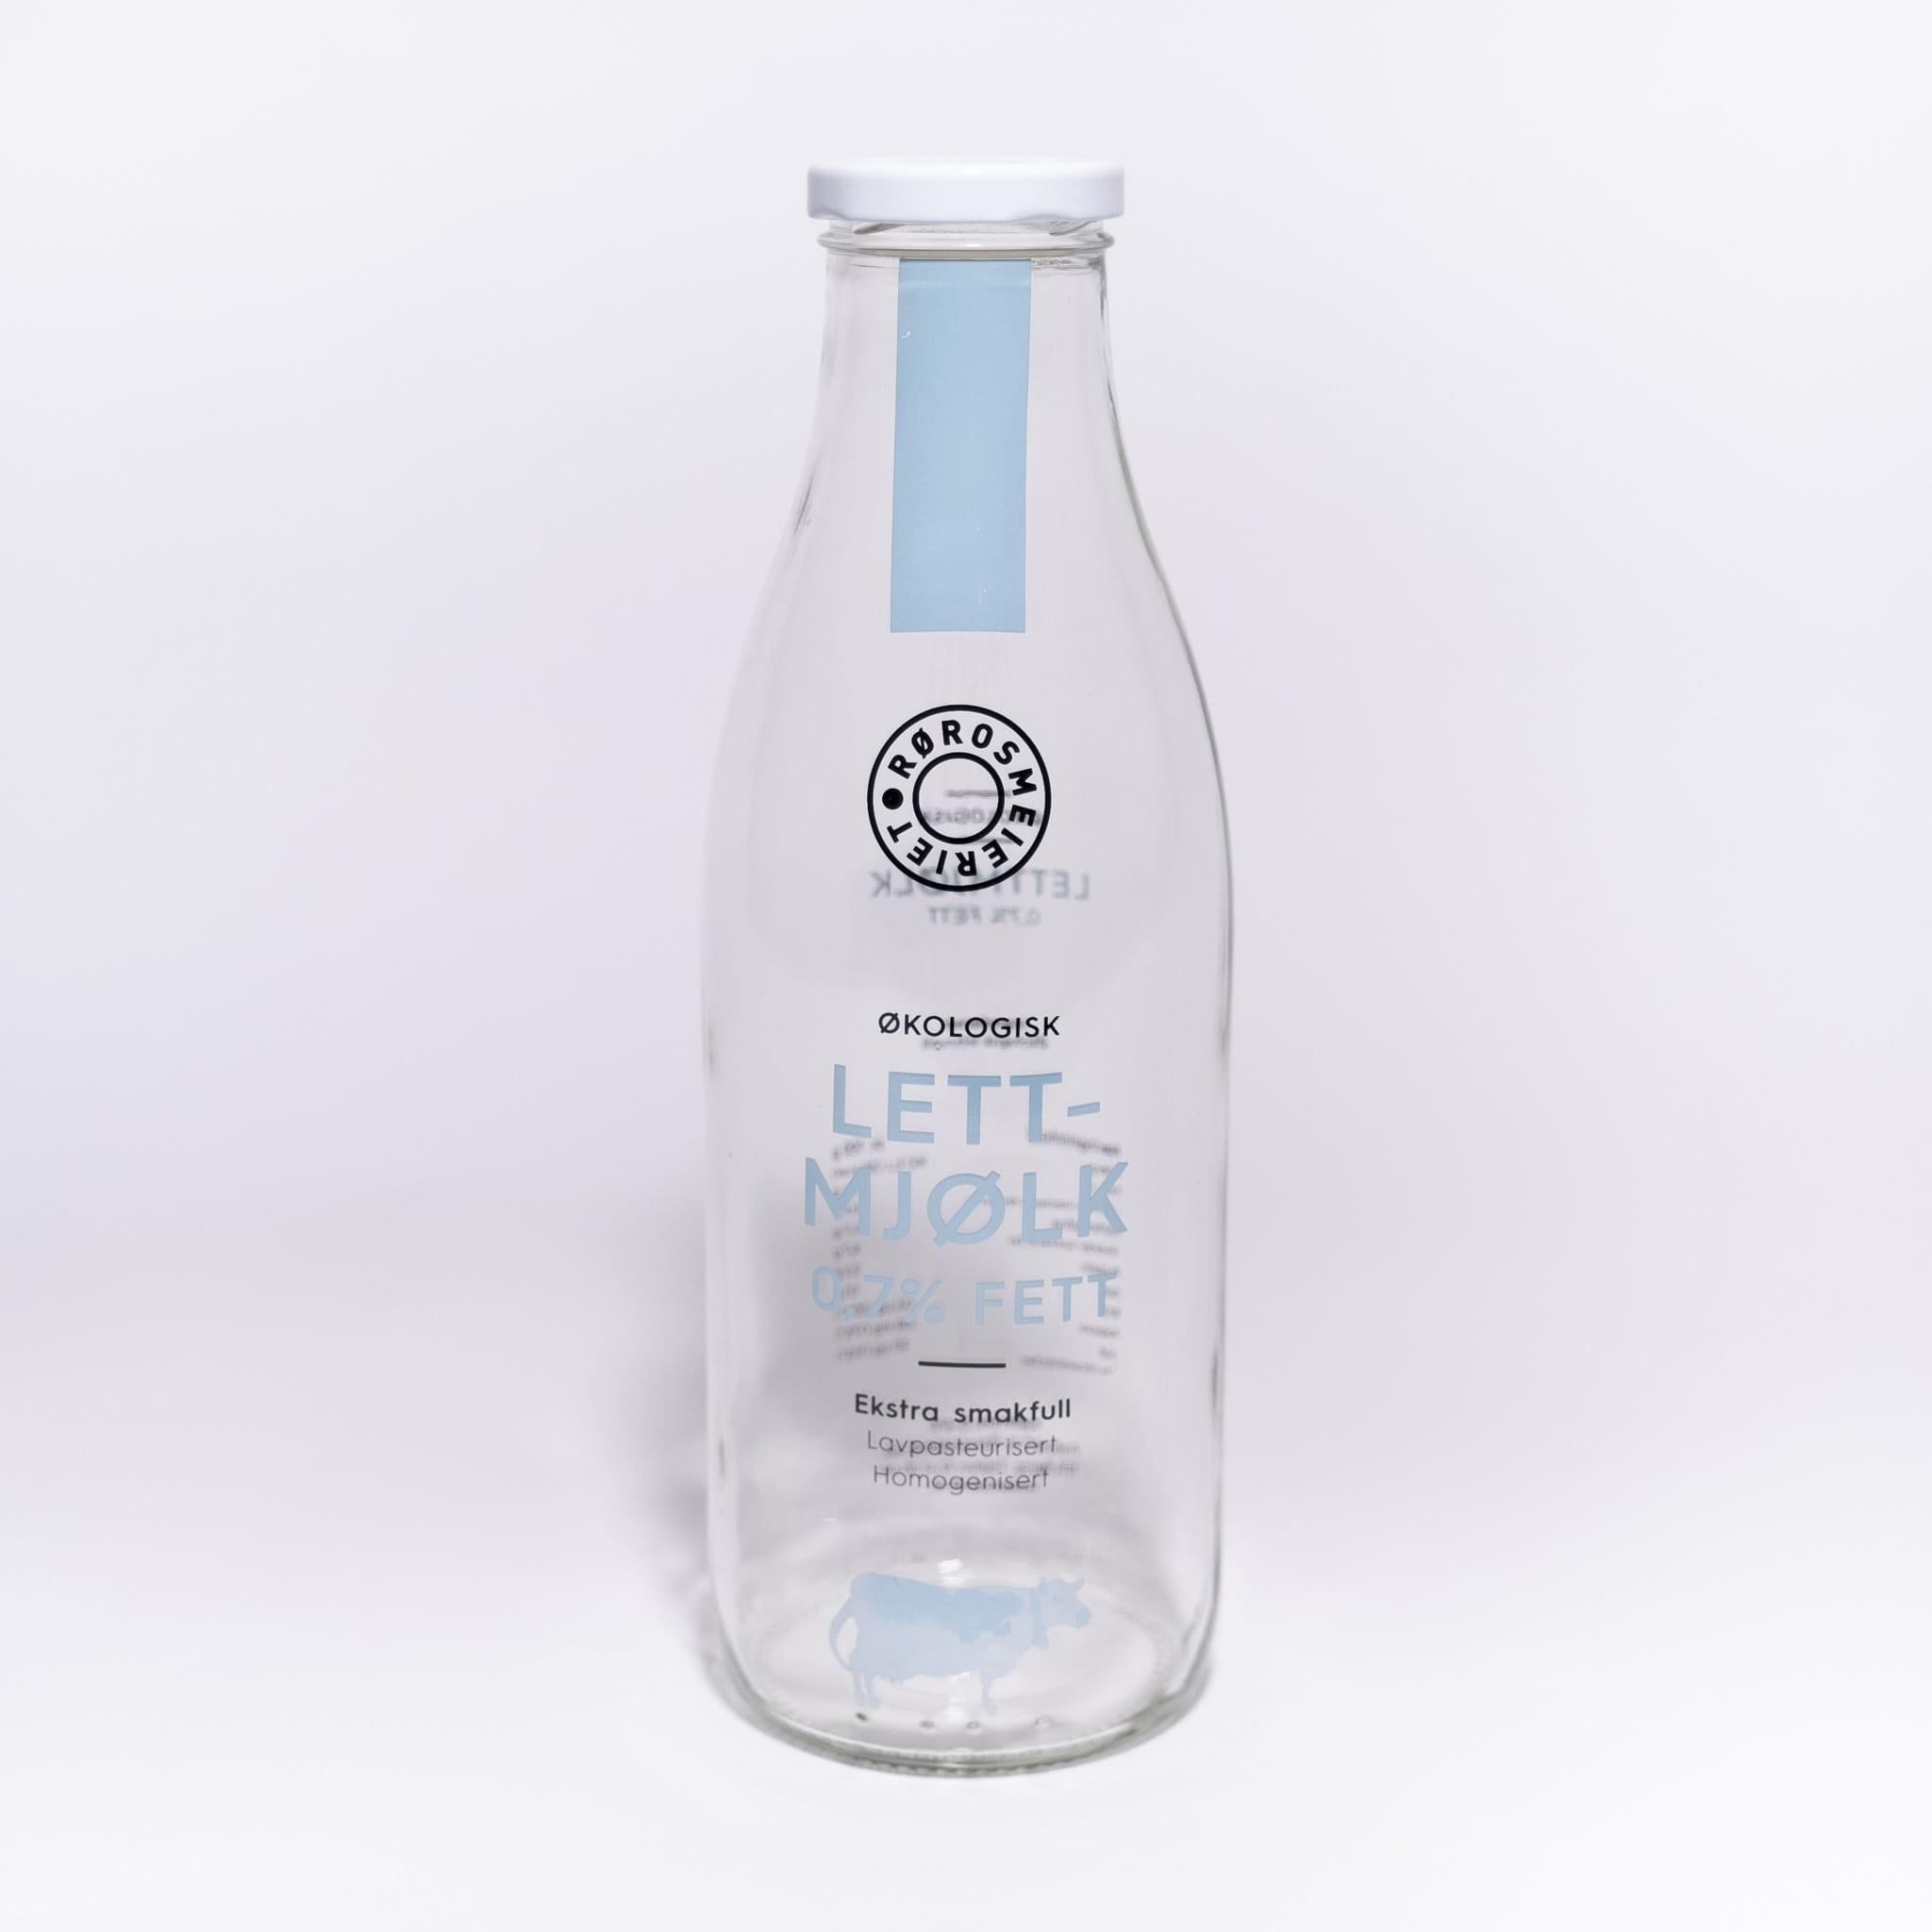 Glassflaske Lettmjølk 0,7 %